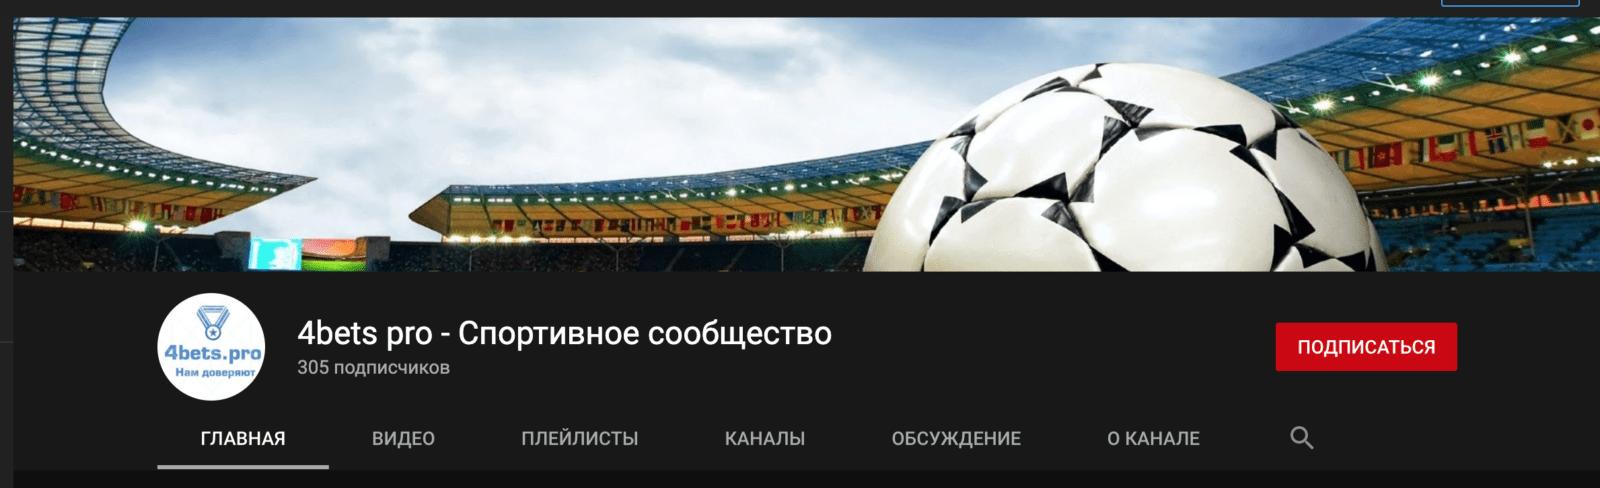 Ютуб канал 4bets.pro (4бетс про)